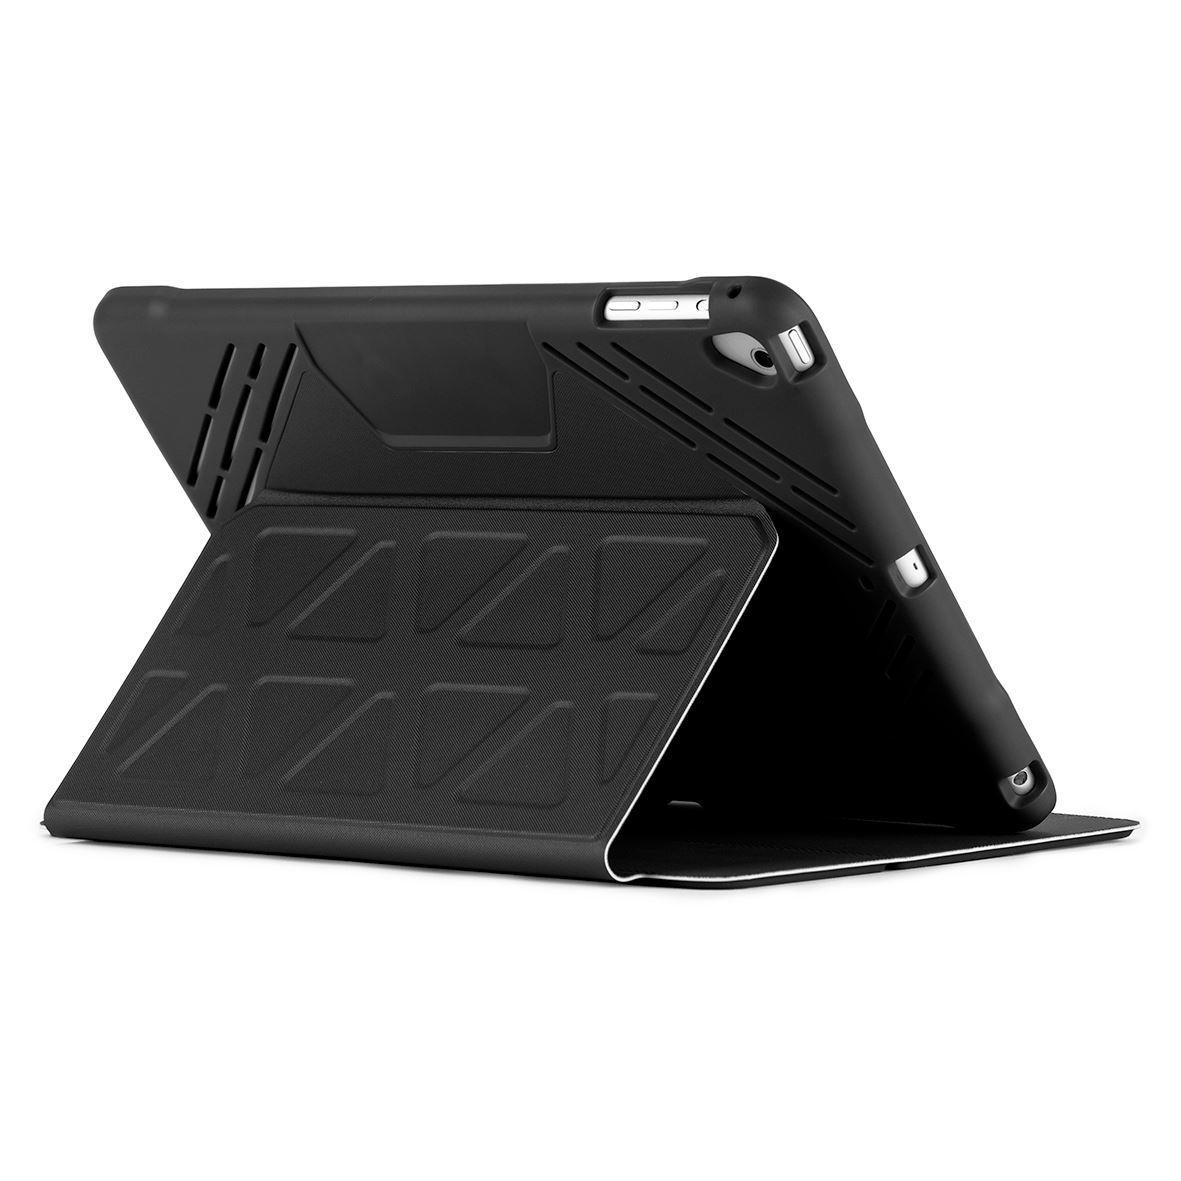 THZ673GL Pro-Tek 3D Protection Case 10.5 inch iPad Pro Black